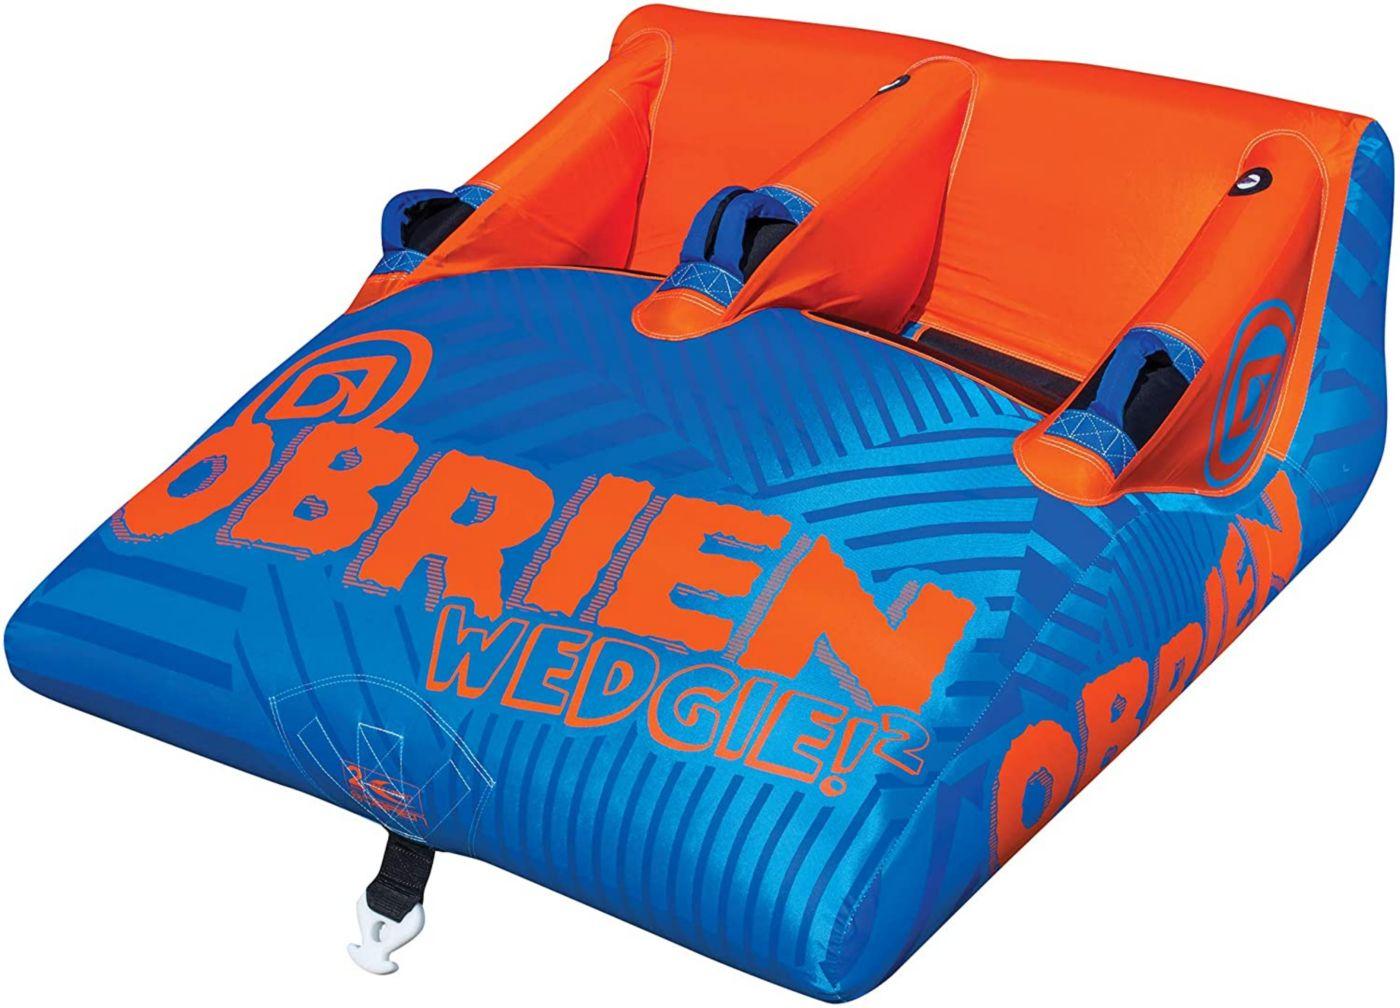 O'Brien Wedgie 2 Towable Boat Tube